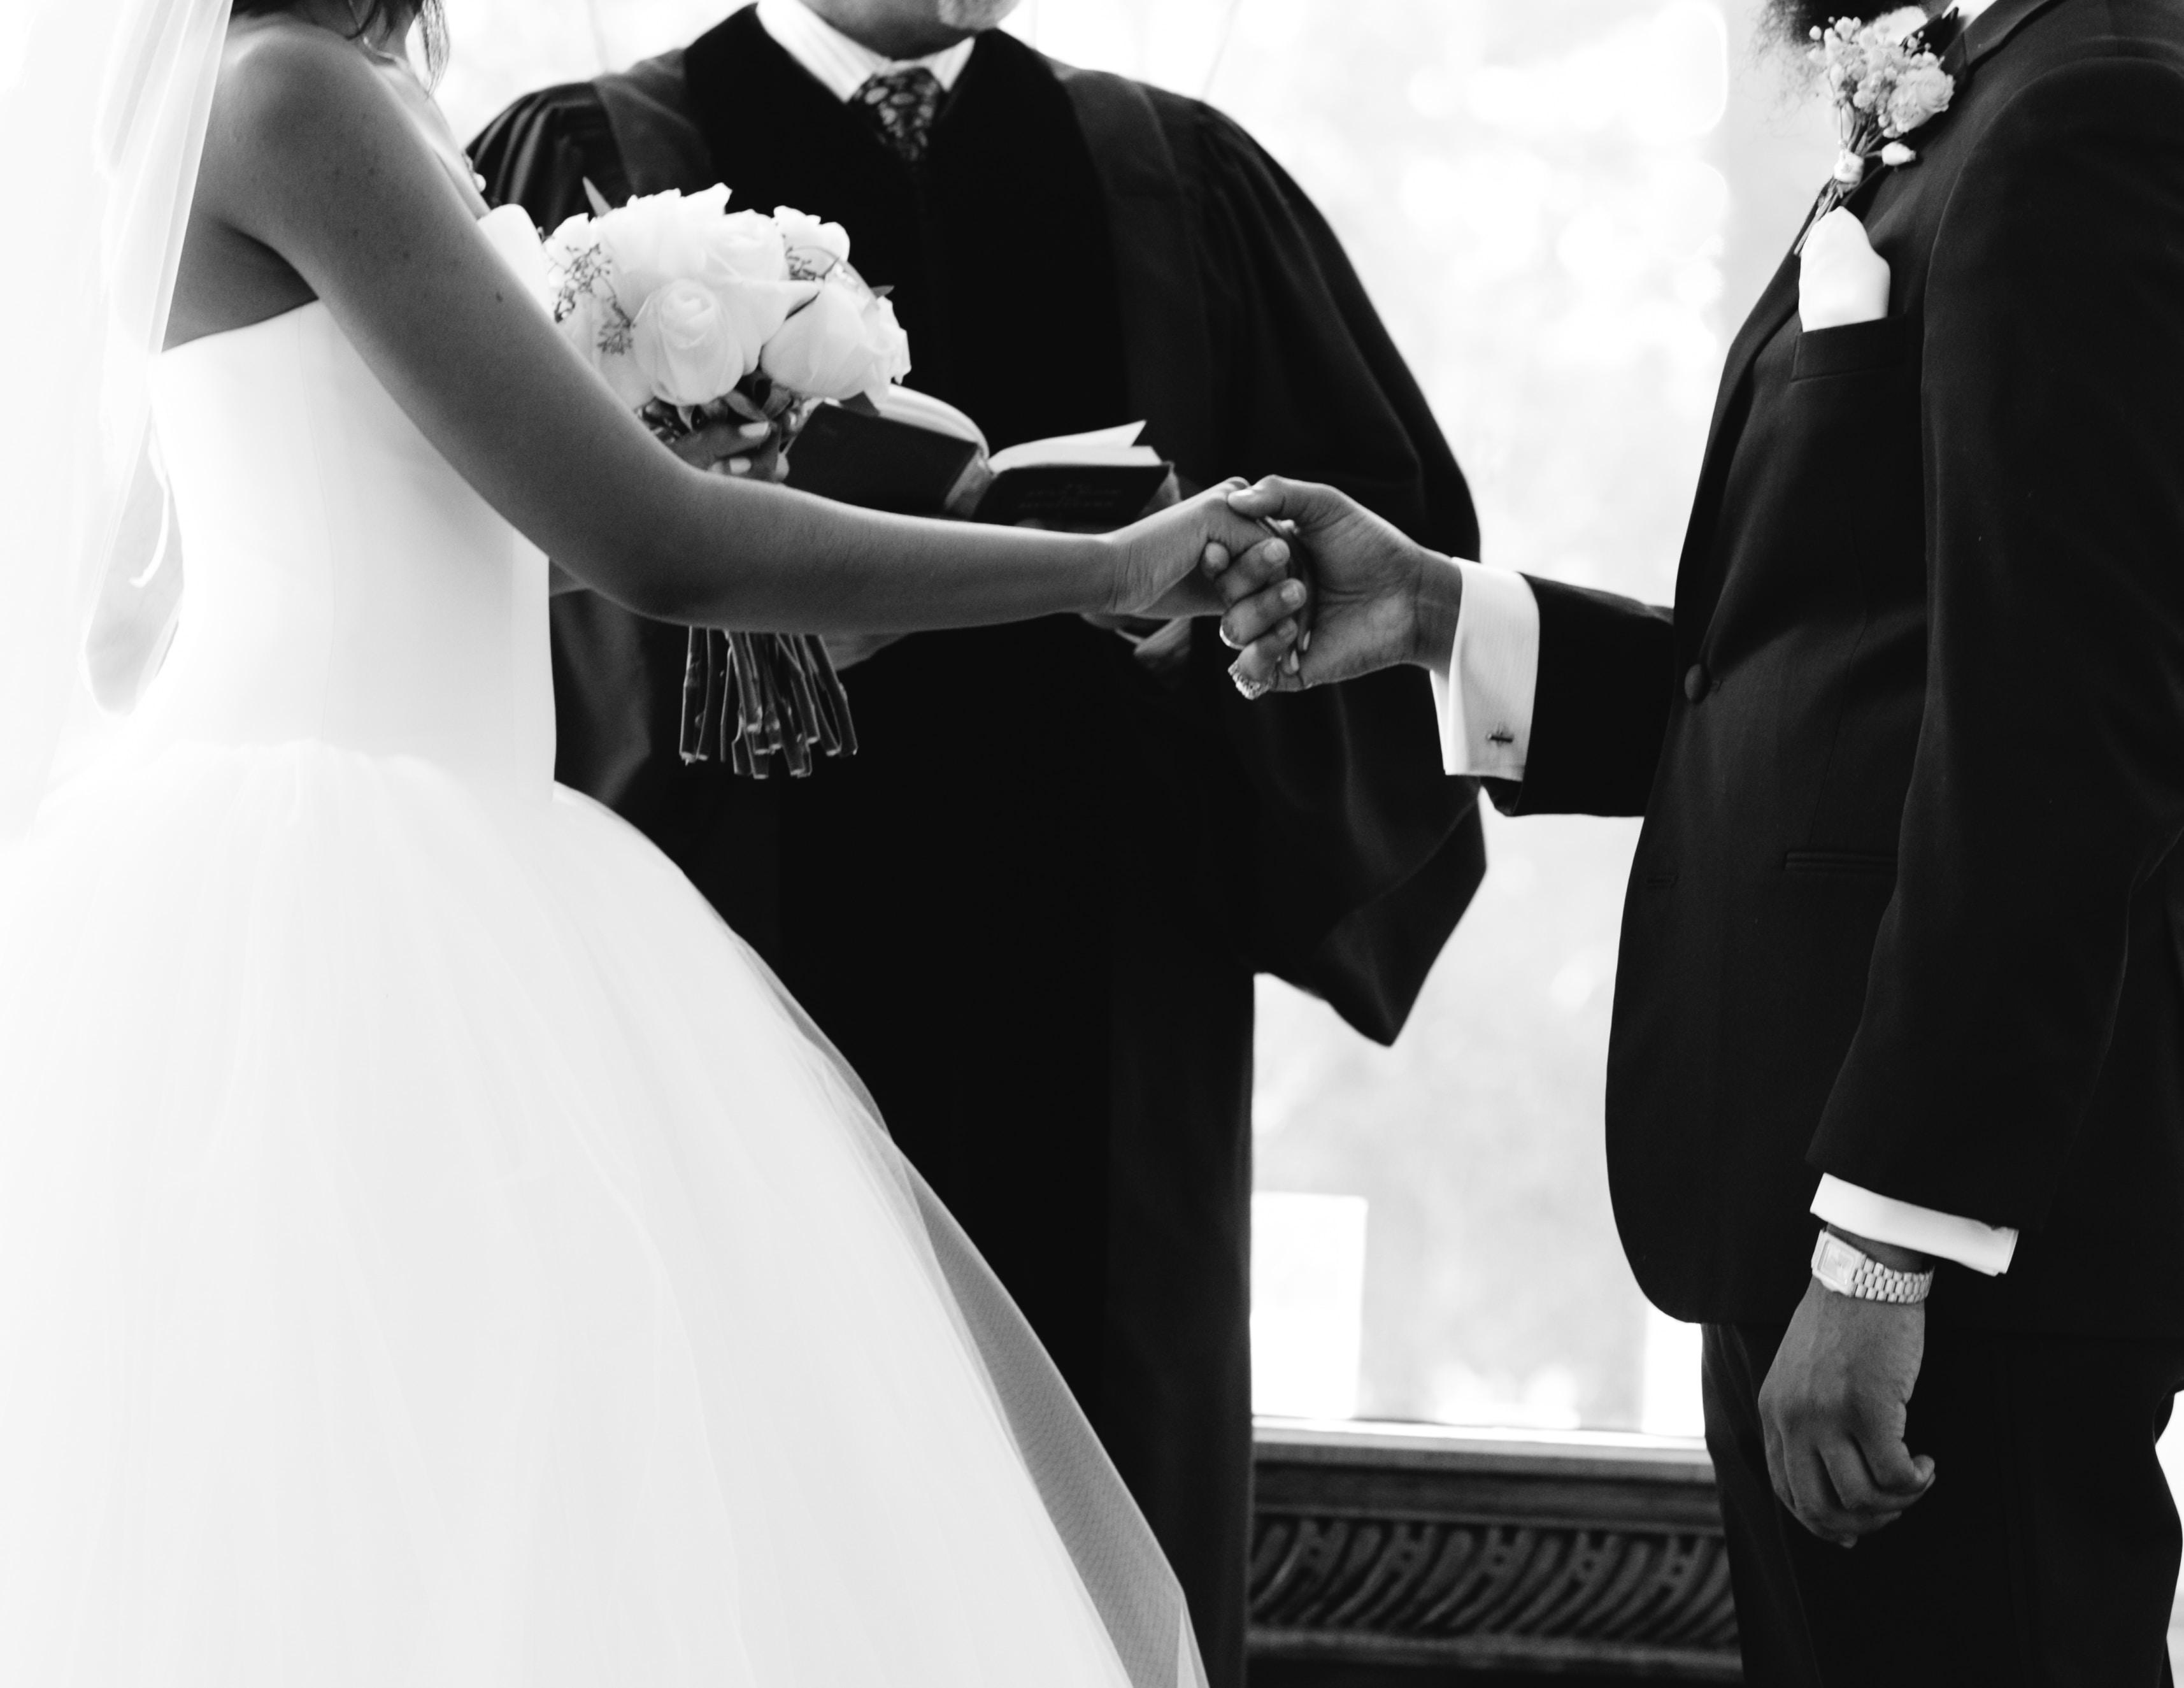 grayscale photography of newlywed couple